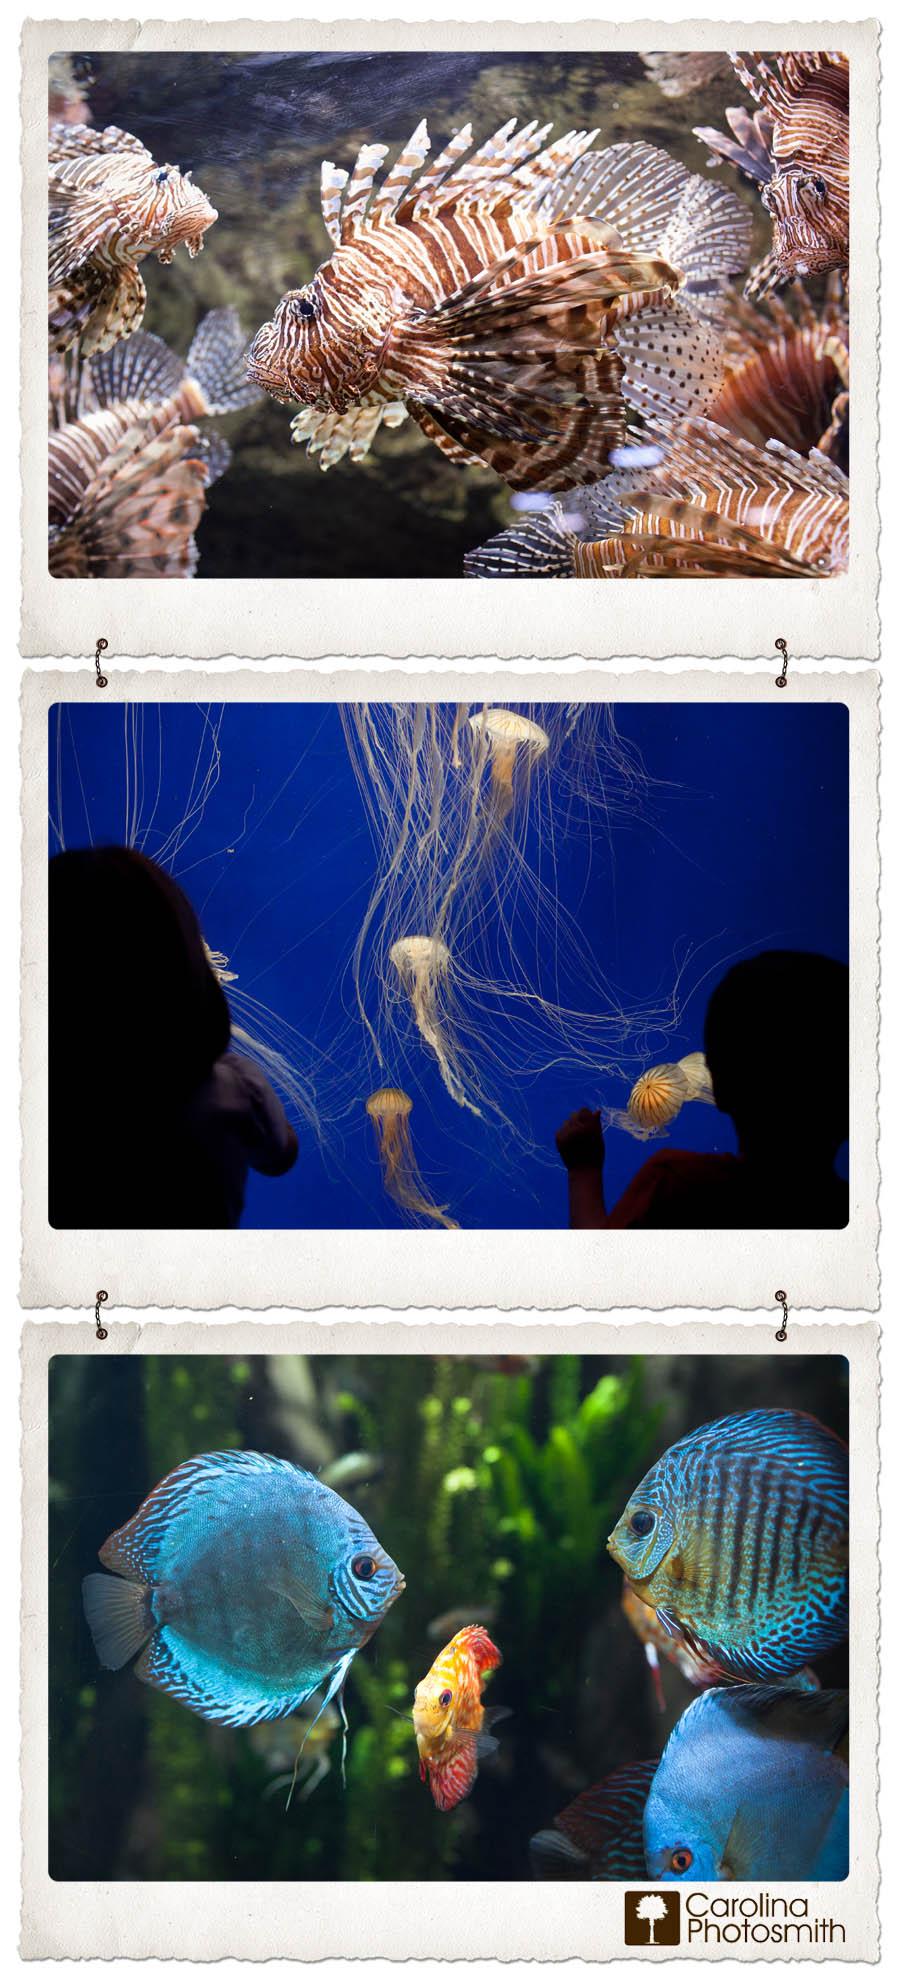 Colorful Amazonian Fish, Mesmerizing Jellies at the Georgia Aquarium